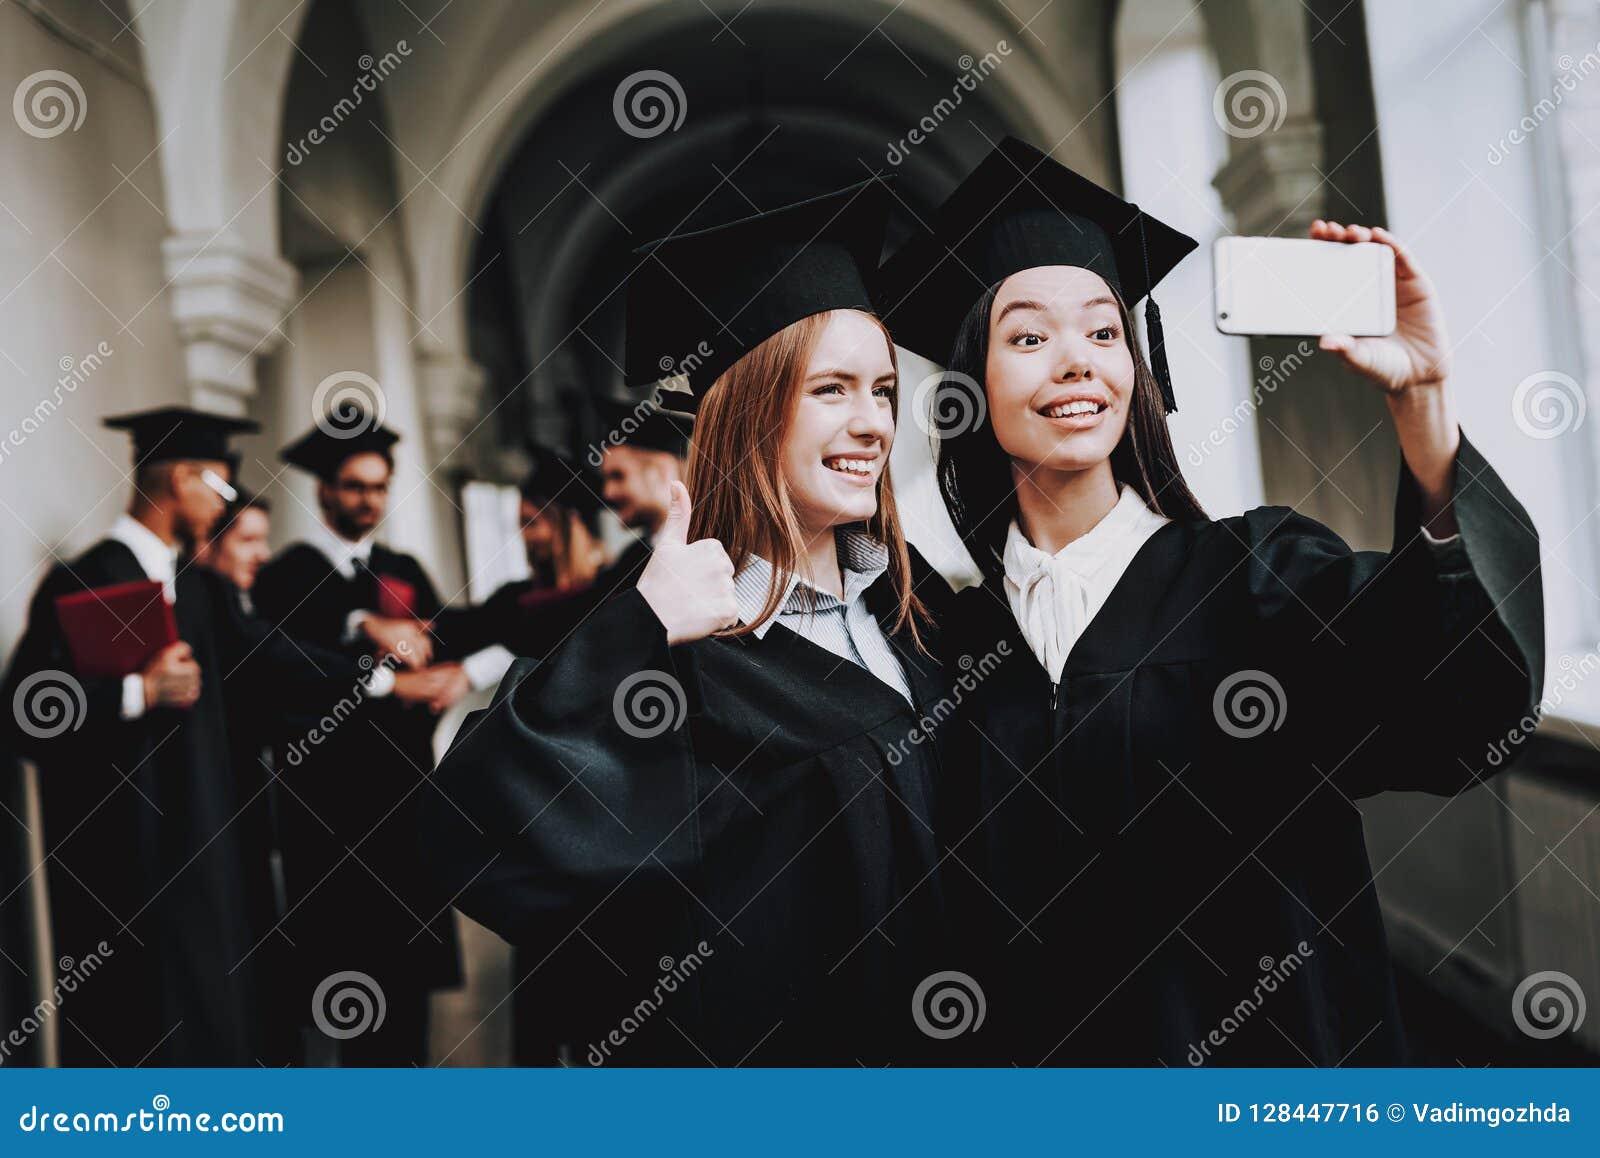 Happiness. Girls. Intelligence.Diploma.University.